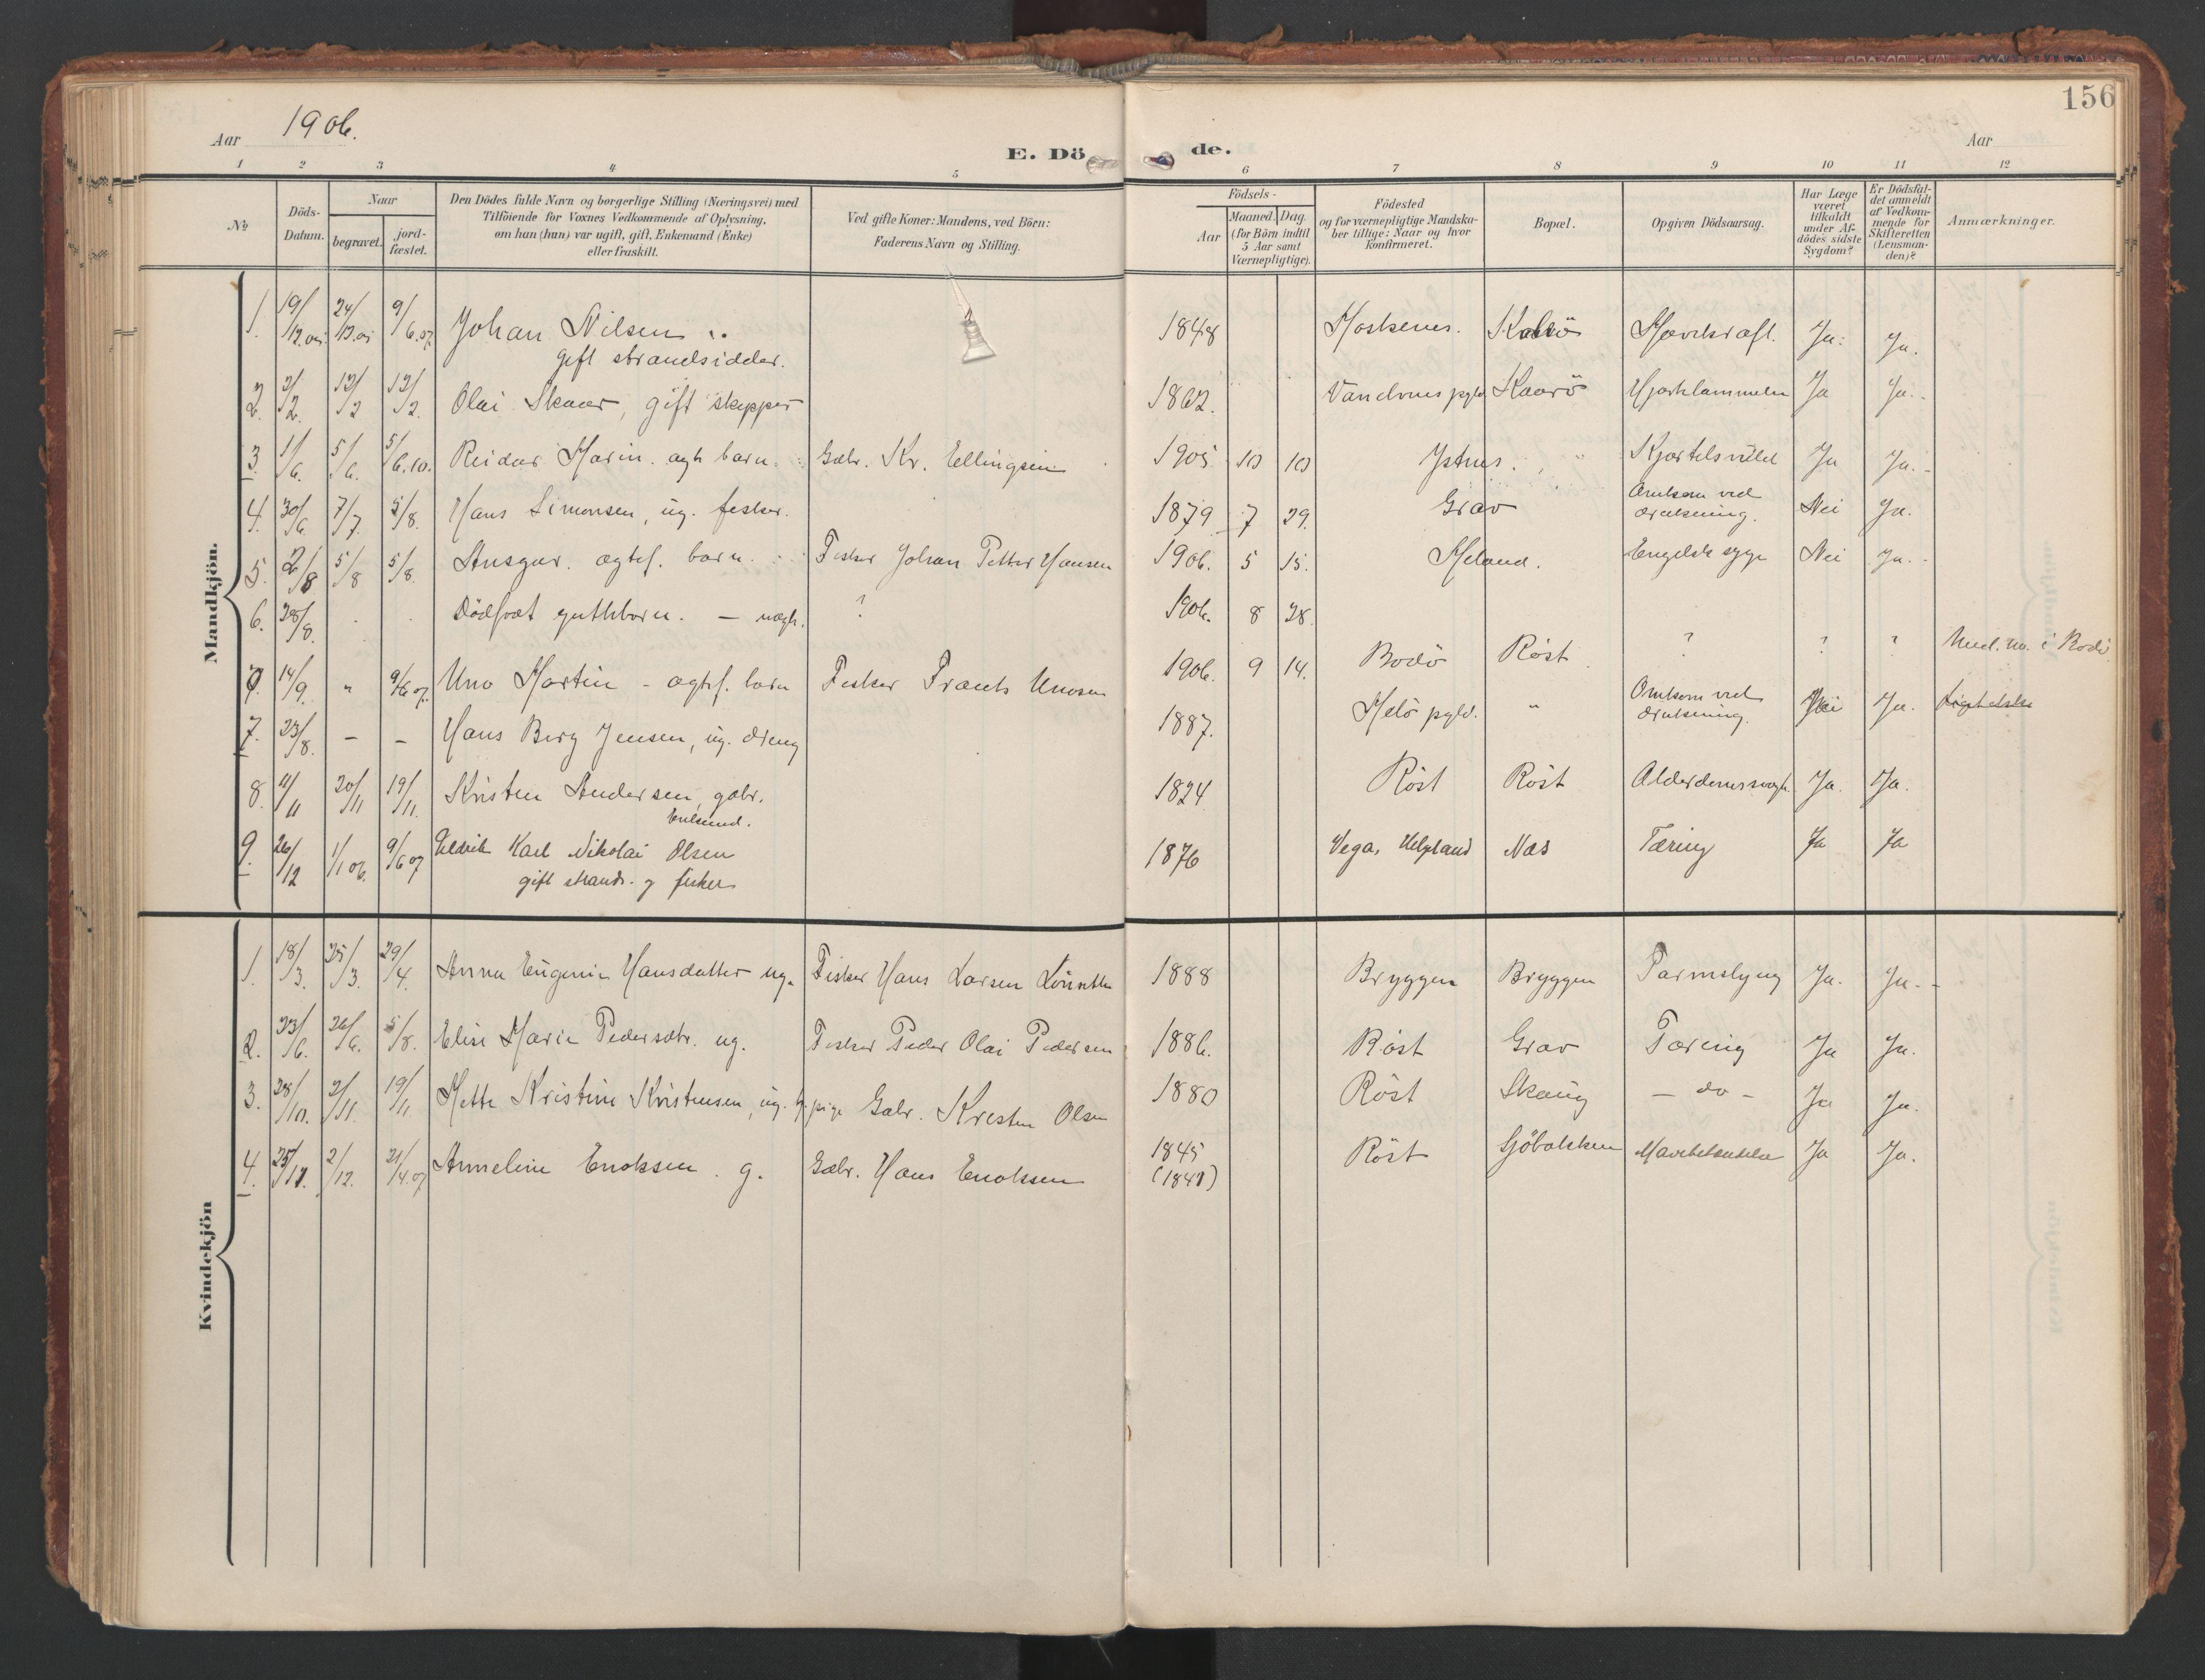 SAT, Ministerialprotokoller, klokkerbøker og fødselsregistre - Nordland, 808/L0129: Ministerialbok nr. 808A02, 1903-1931, s. 156